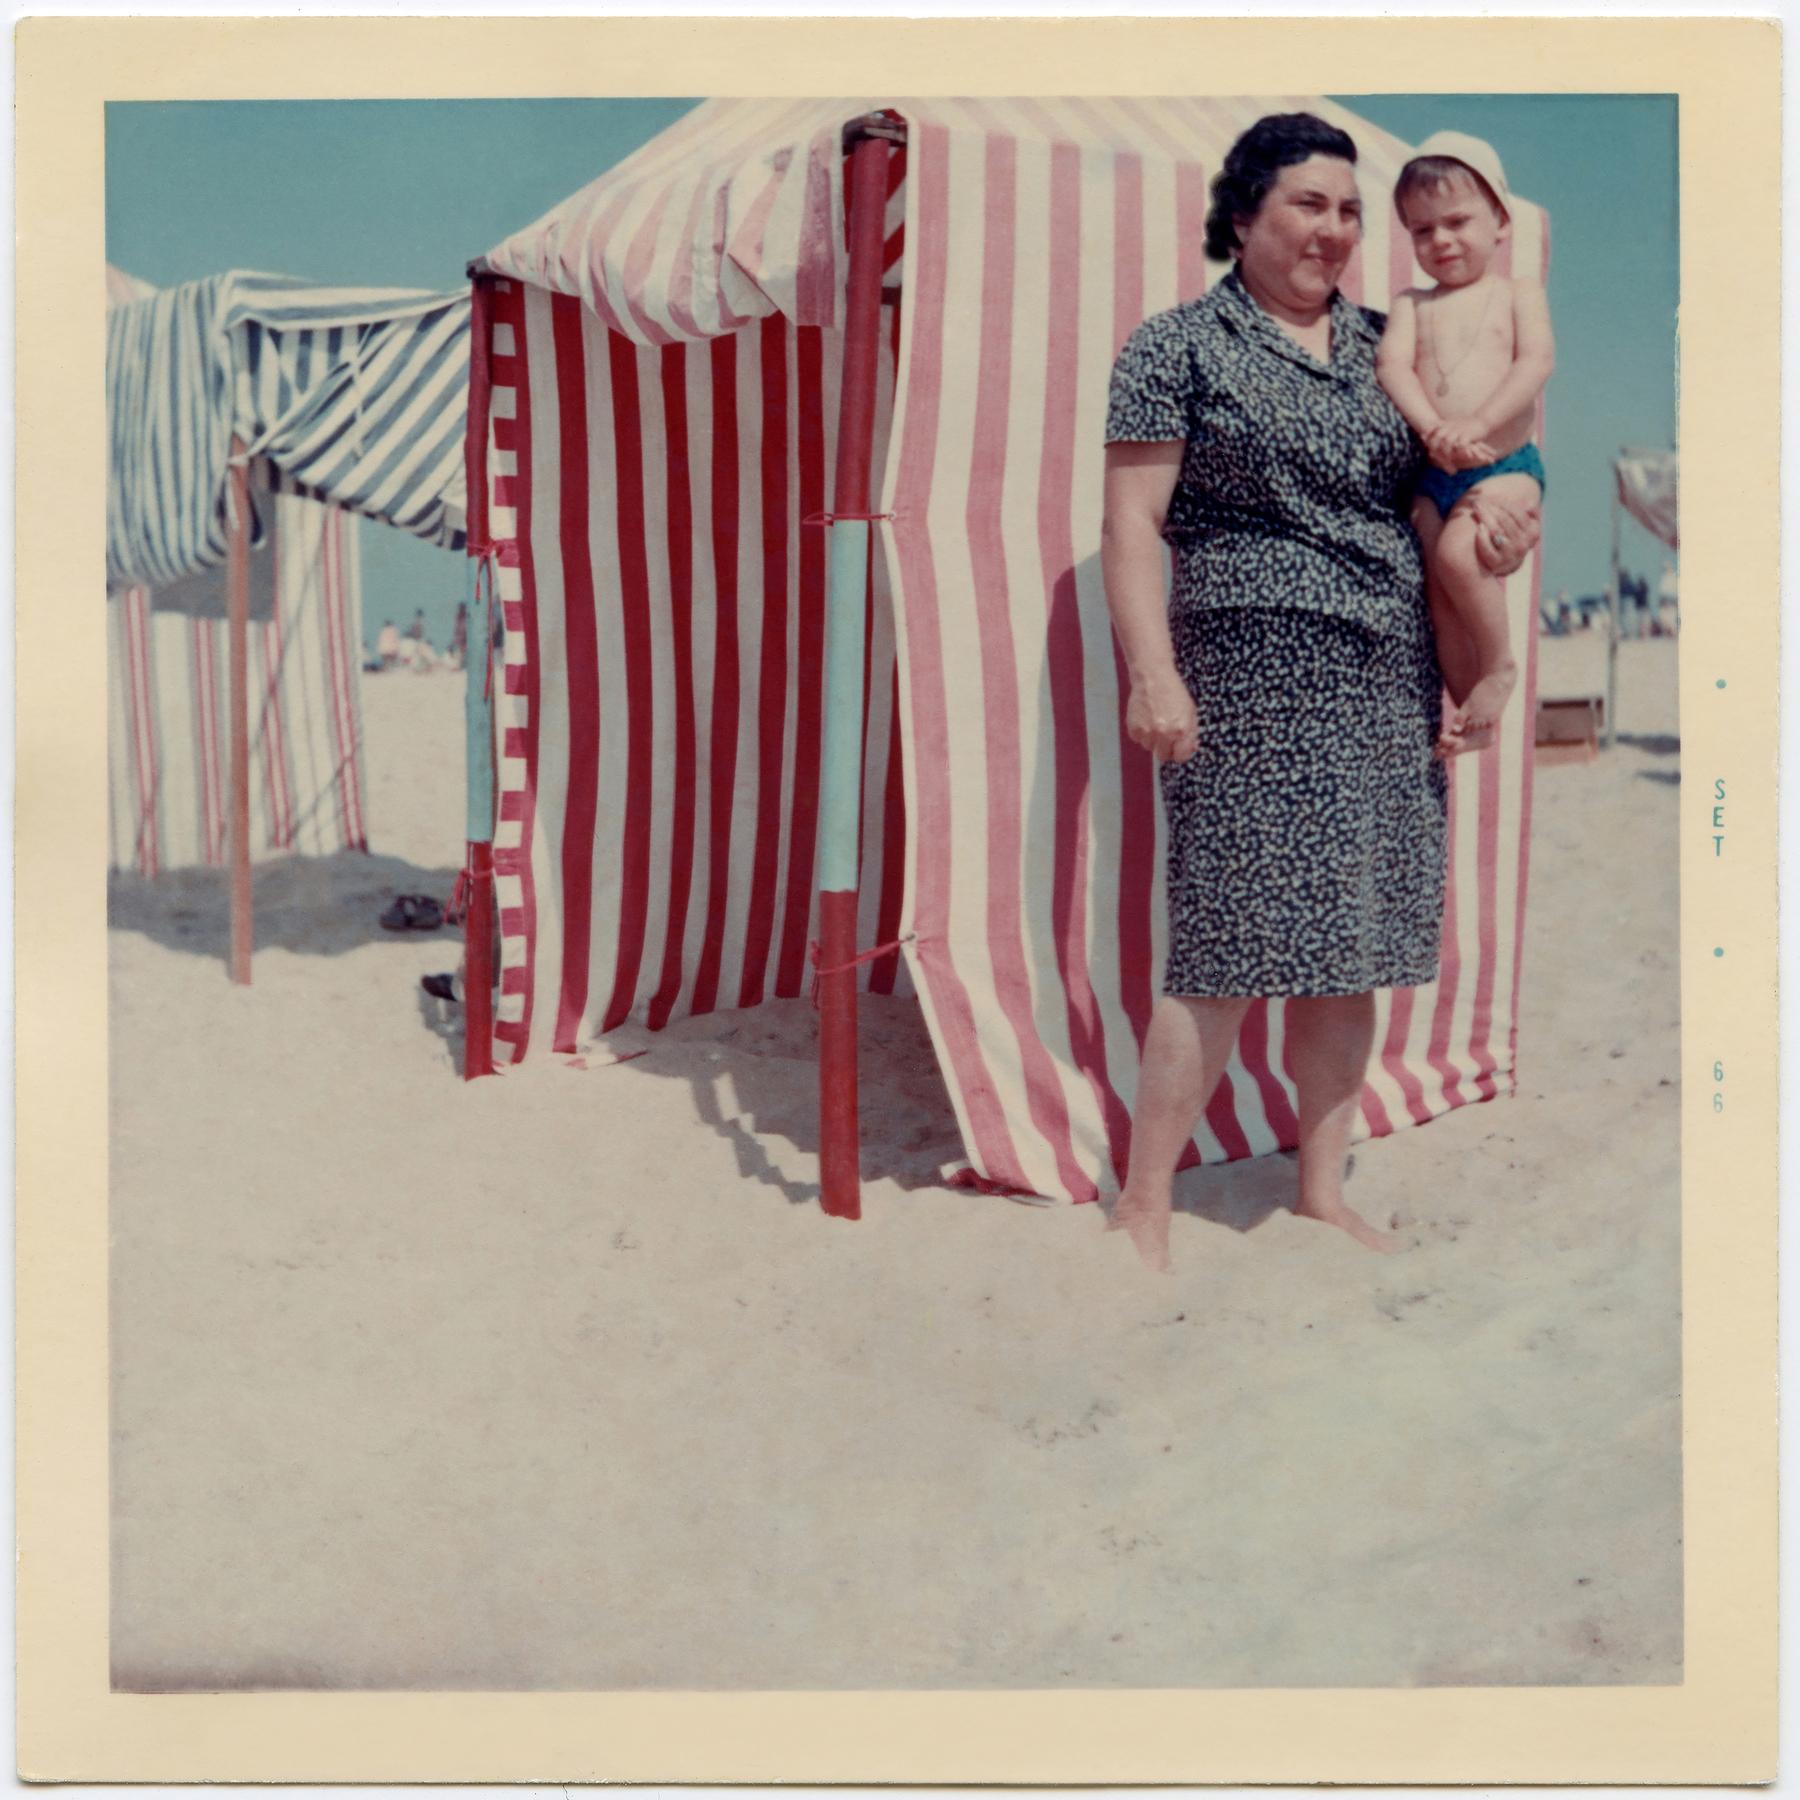 Kodachrome Summer, Somewhere in Portugal, circa 1950's